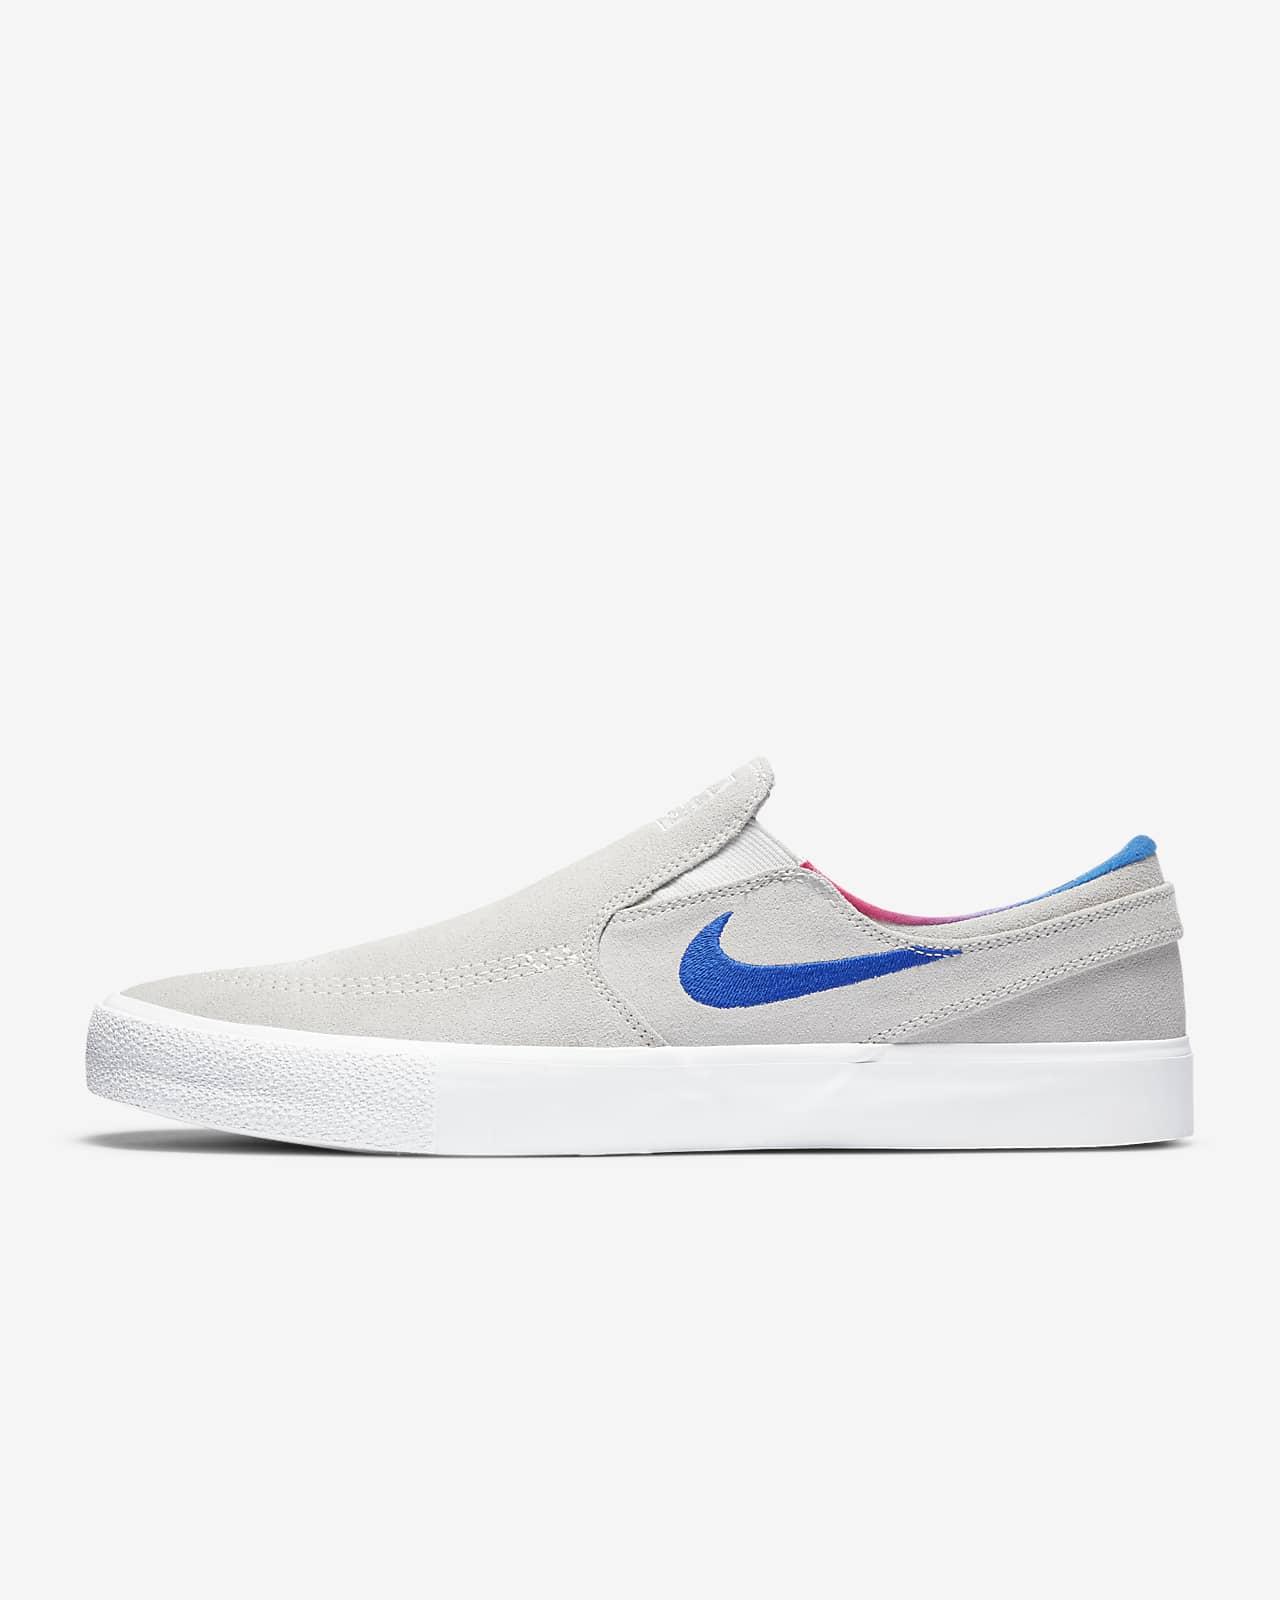 Nike SB Zoom Stefan Janoski Slip RM T Skate Shoe